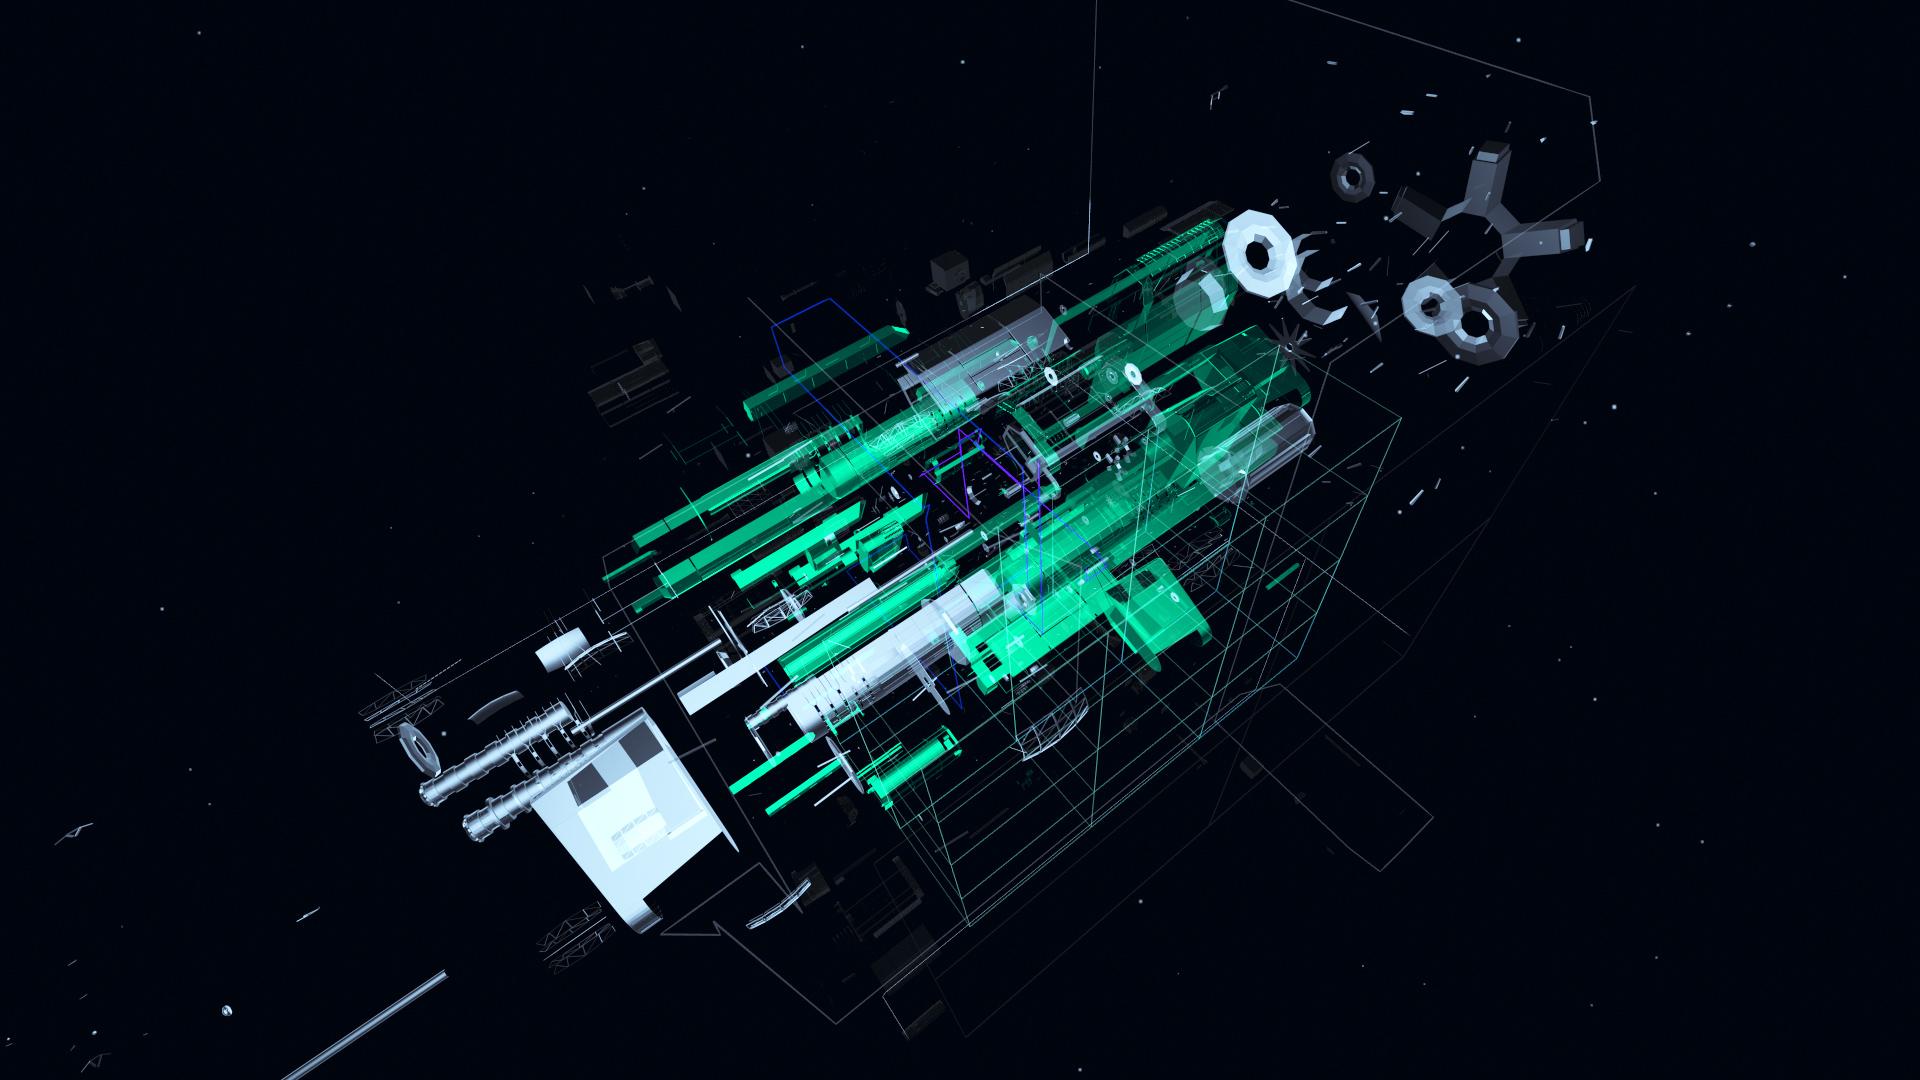 3-LYR-5-ANGLE-2-25427.jpg